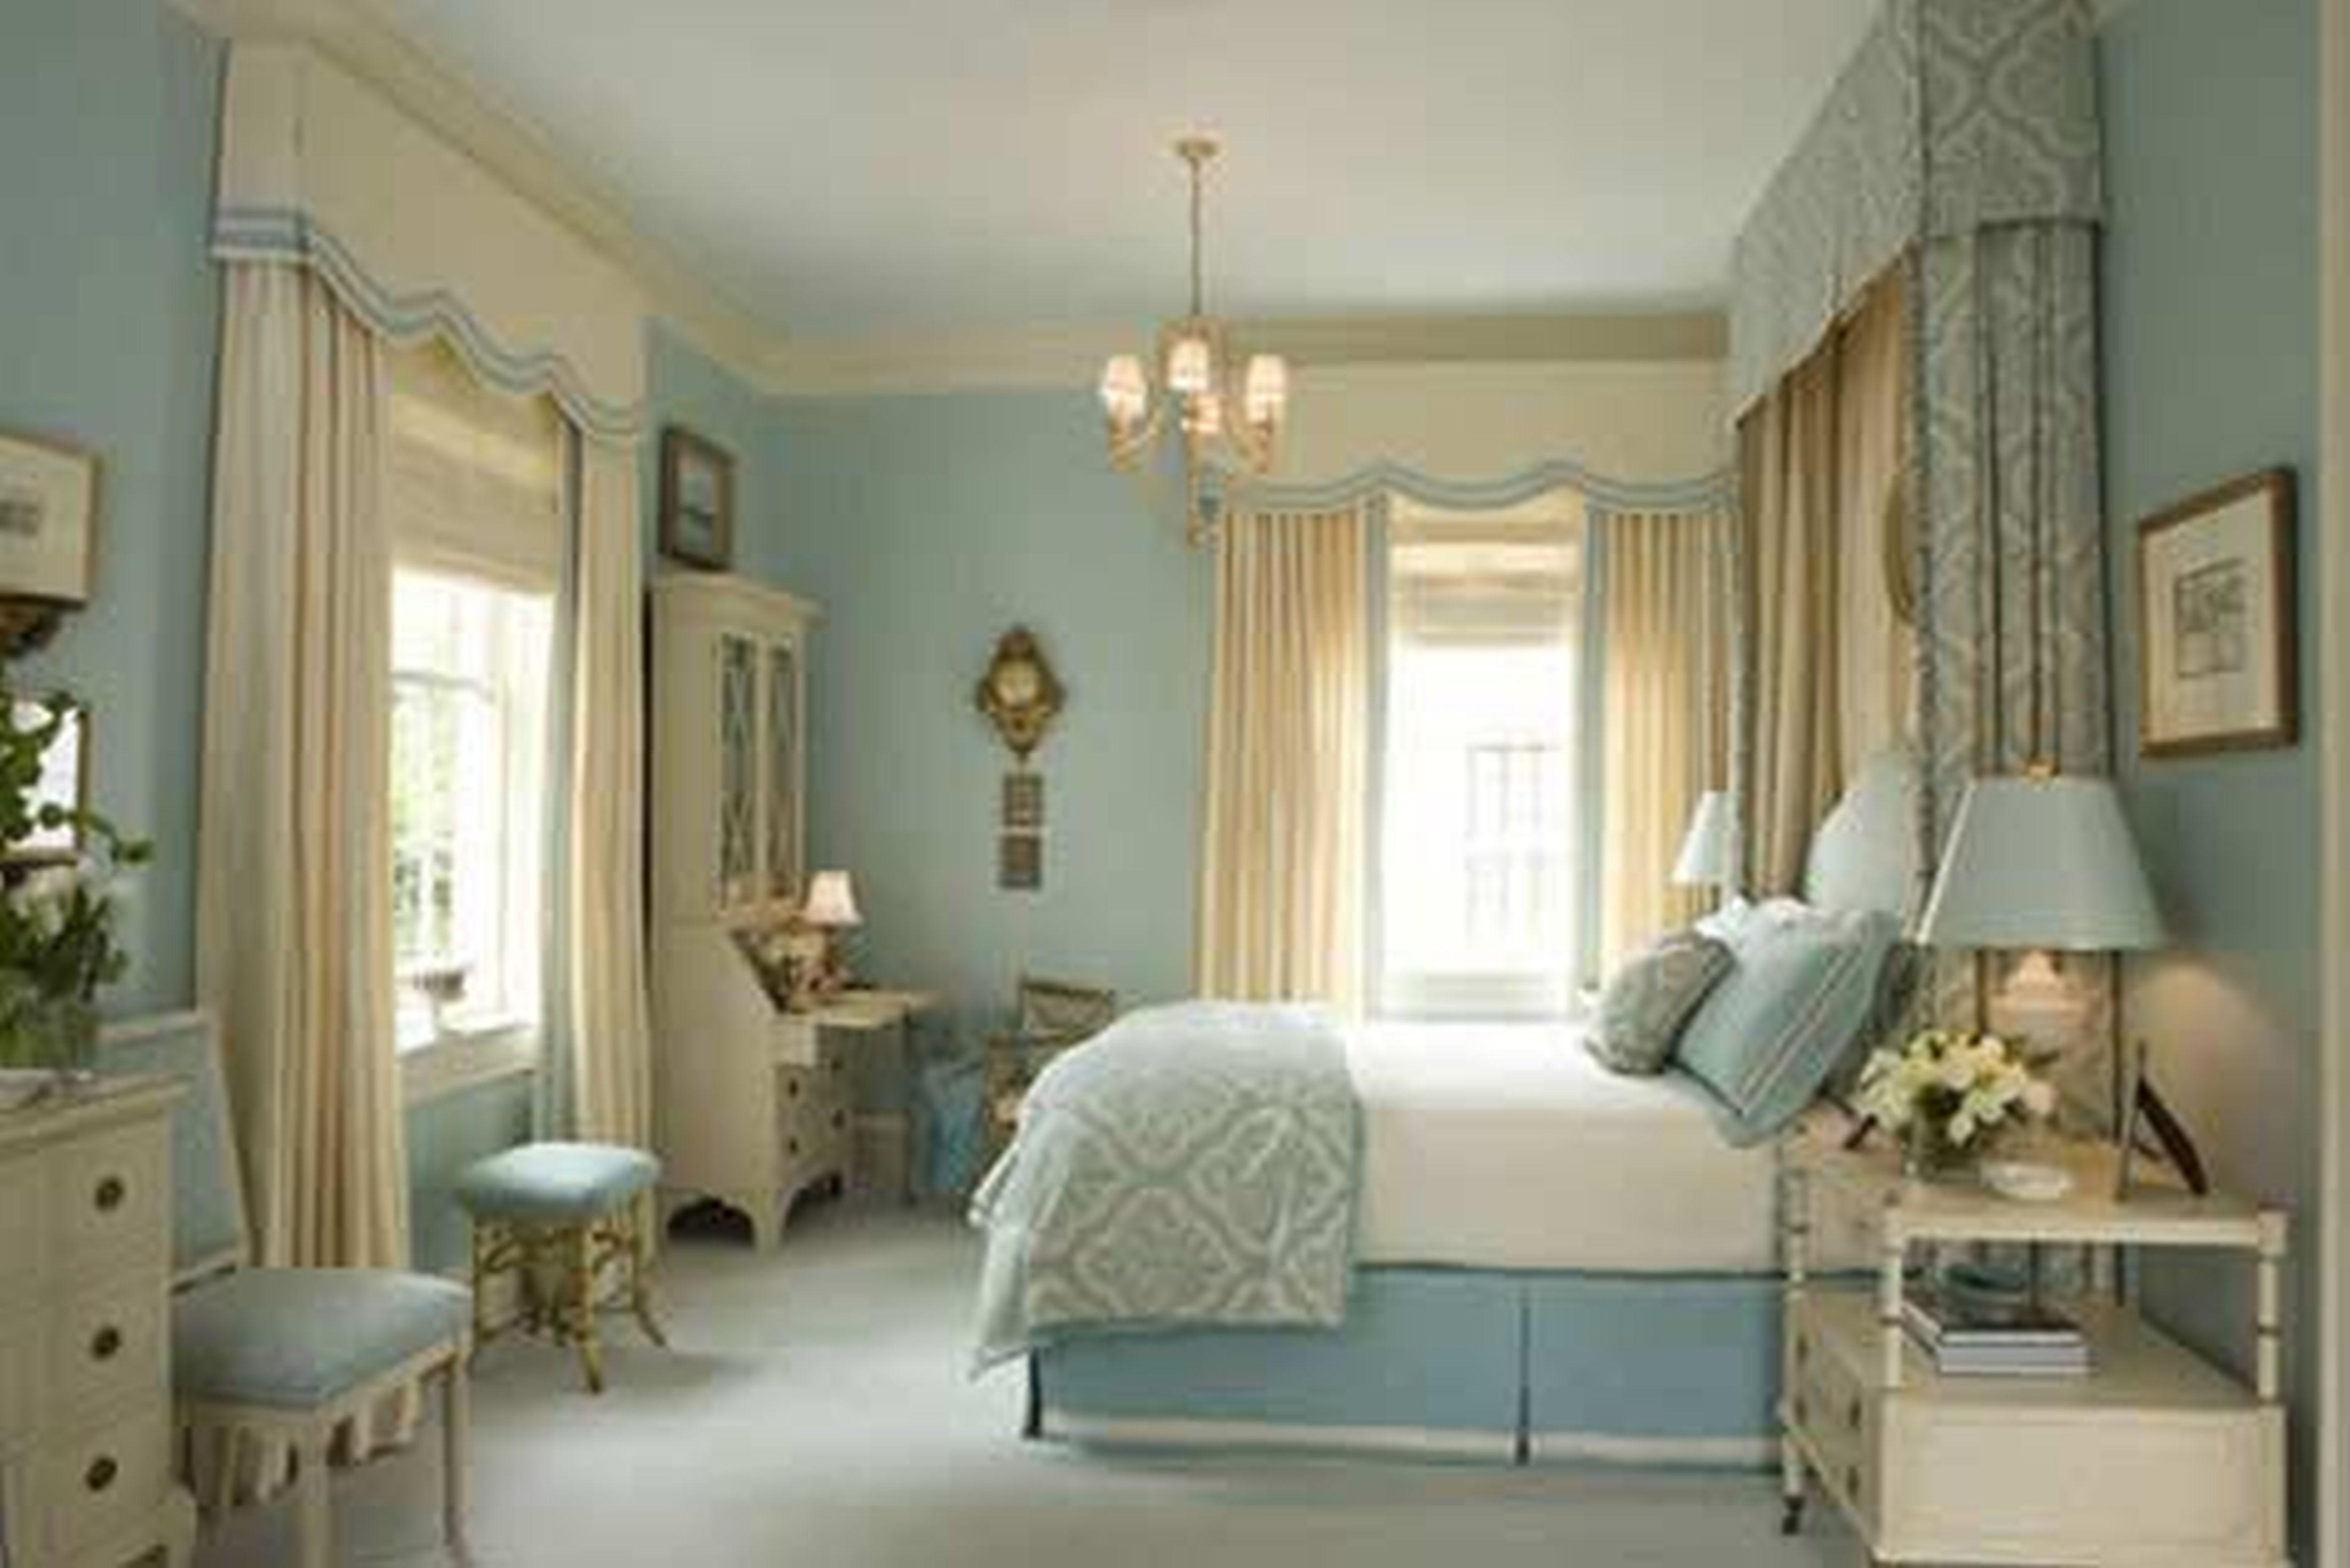 Bedroom Design Duck Egg Blue